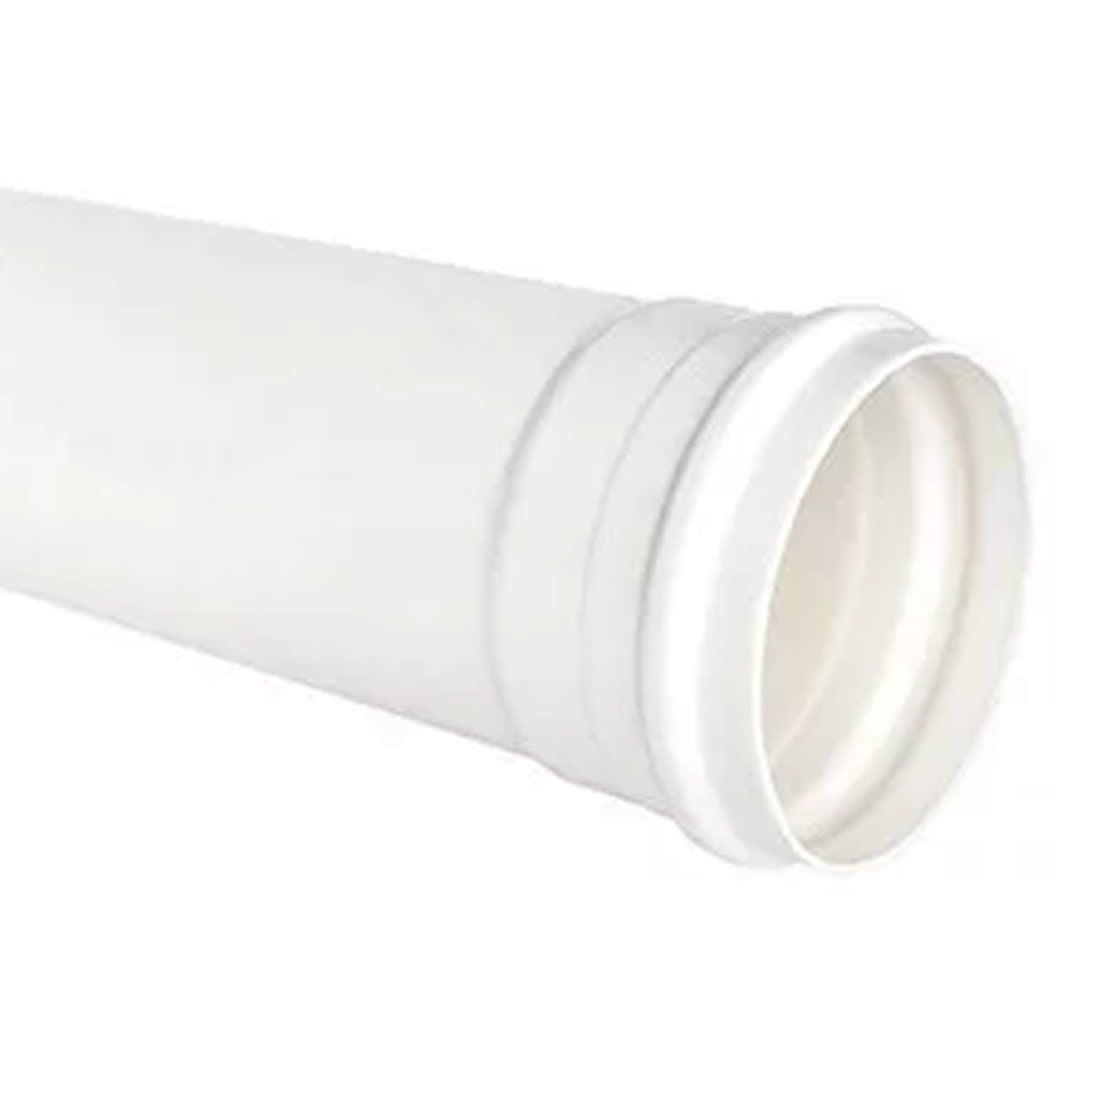 Tubo PVC Para Esgoto 150mm X 6 Metros Tigre